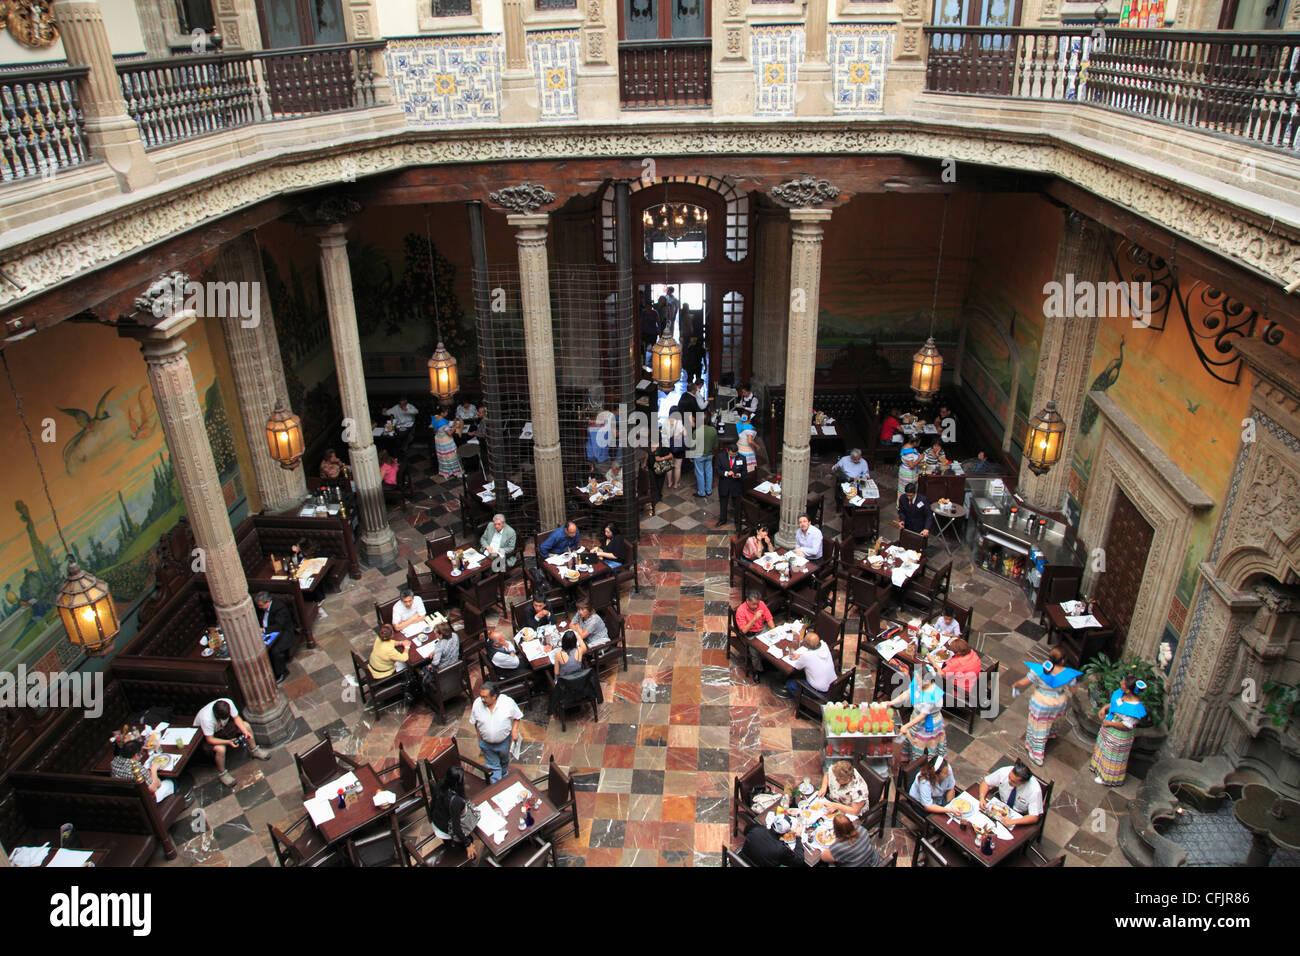 Restaurant sanborns department store mexico city mexico for Sanborns azulejos mexico city